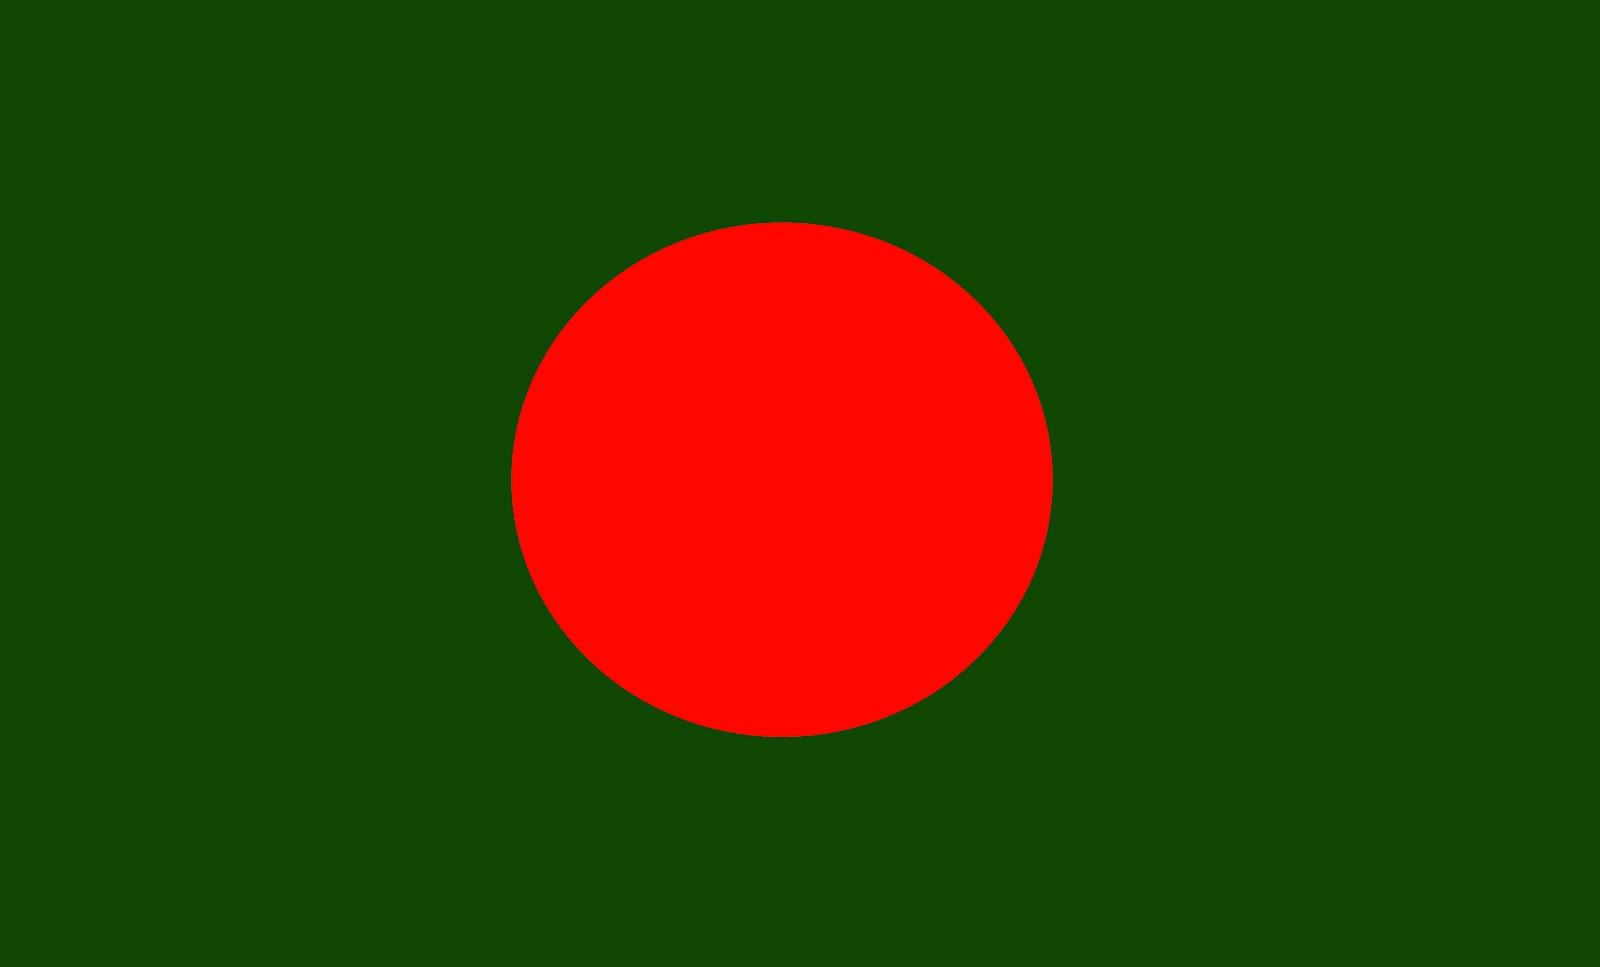 http://1.bp.blogspot.com/-zB_xOFHD18U/T_tEt5auPZI/AAAAAAAAAEU/KjiFjDro7_g/s1600/Bangladesh+1.jpg